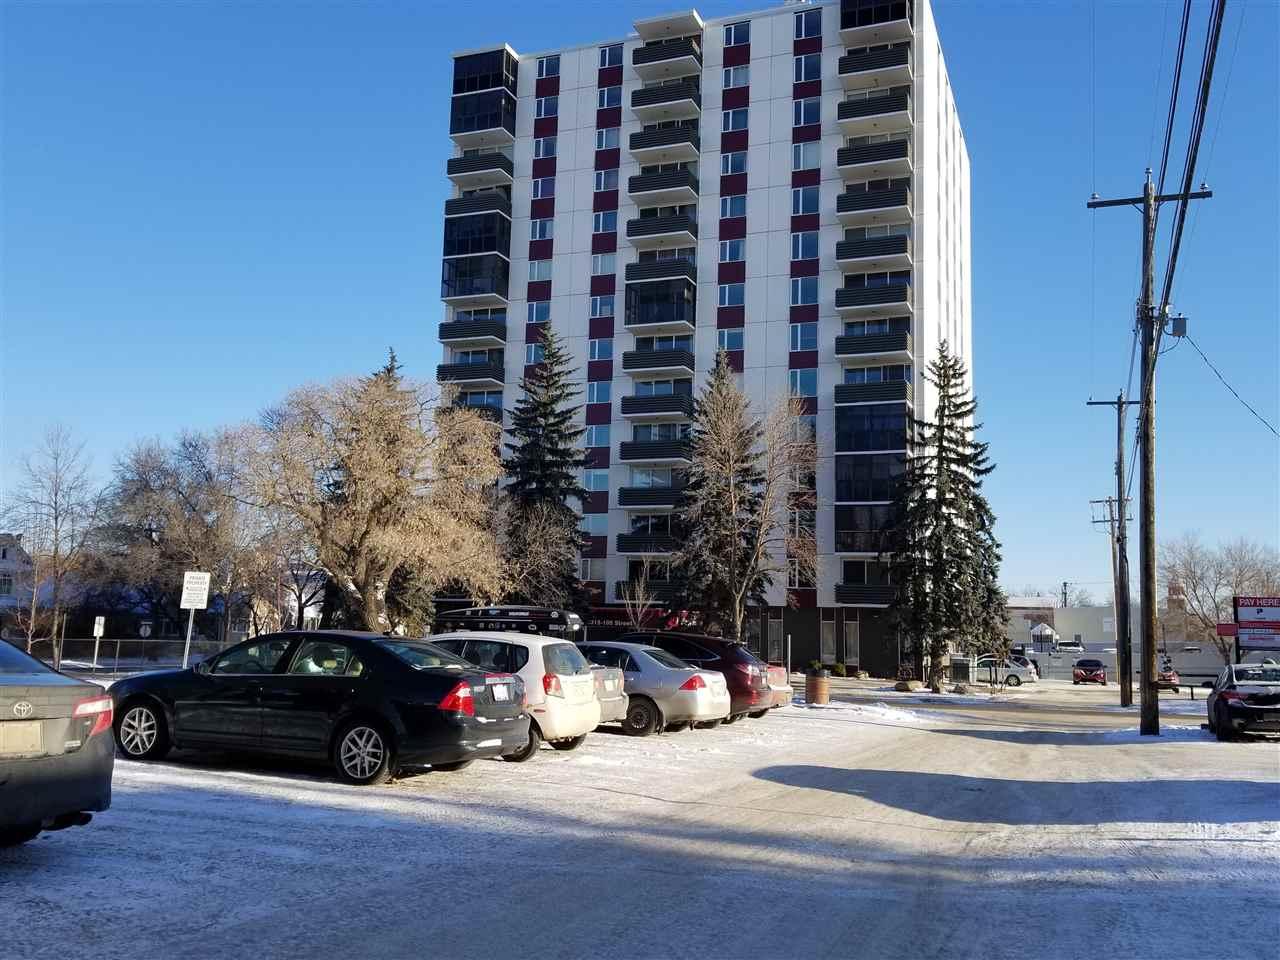 Buliding: 8315 105 Street, Edmonton, AB